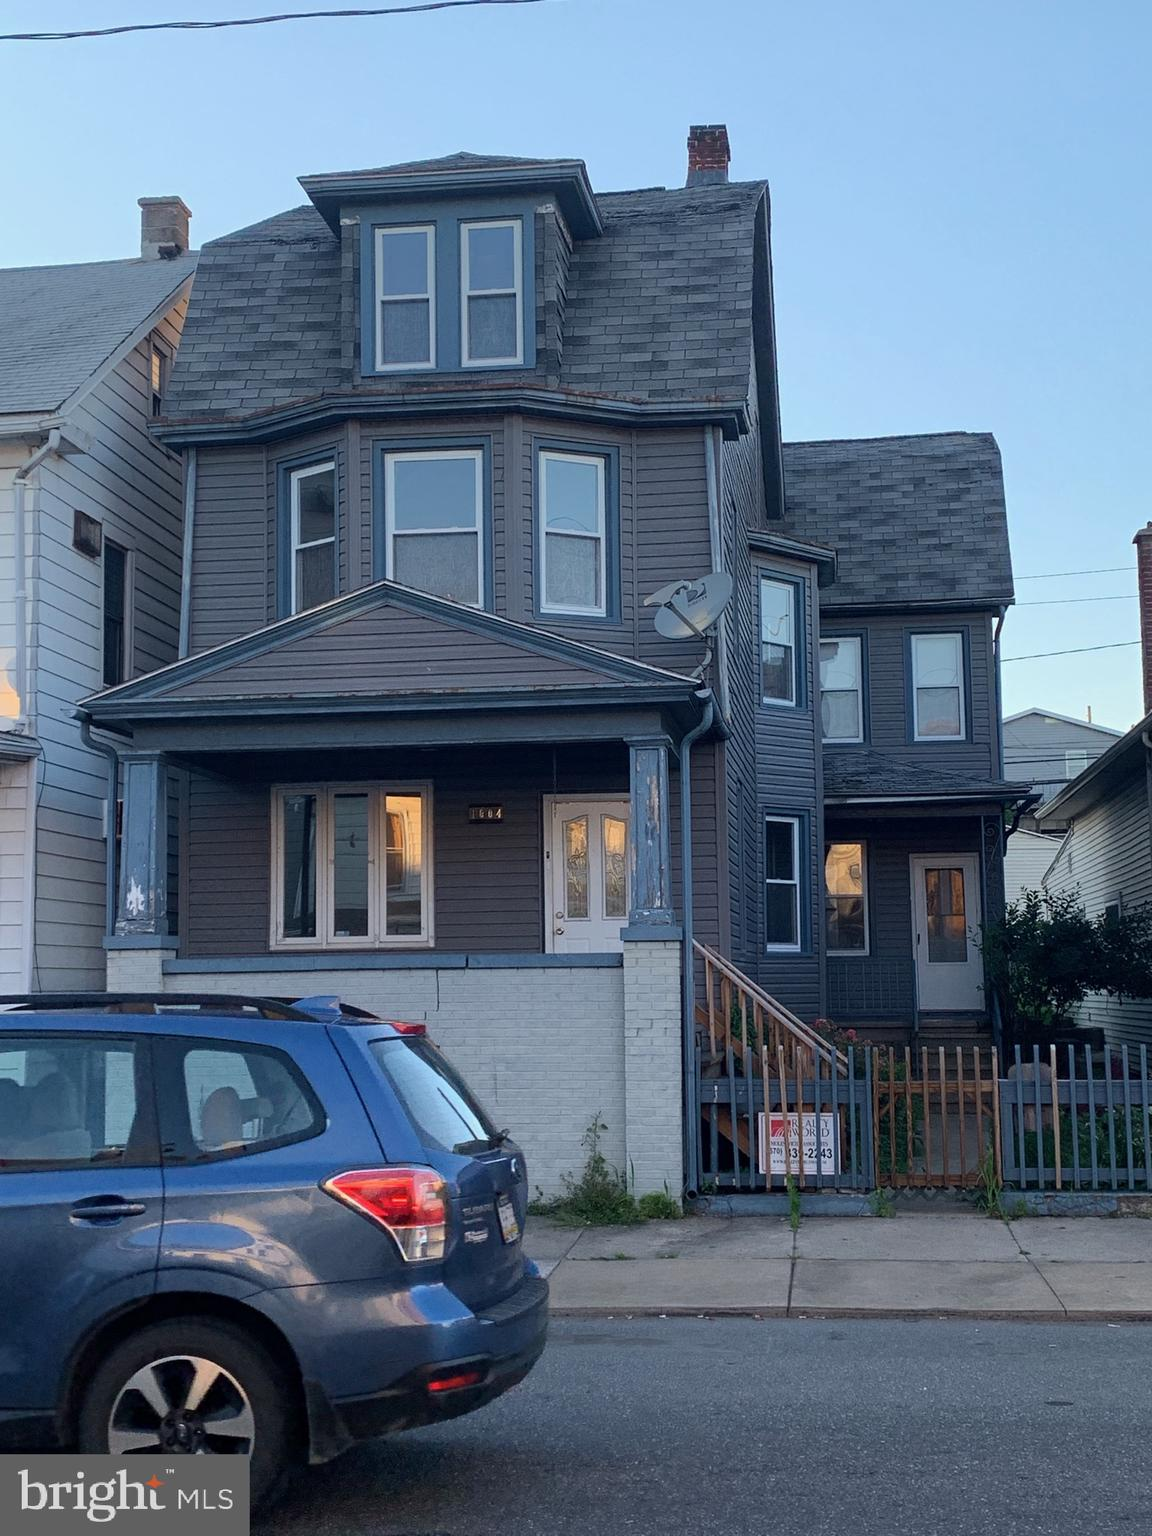 1004 CHESTNUT STREET, KULPMONT, PA 17834